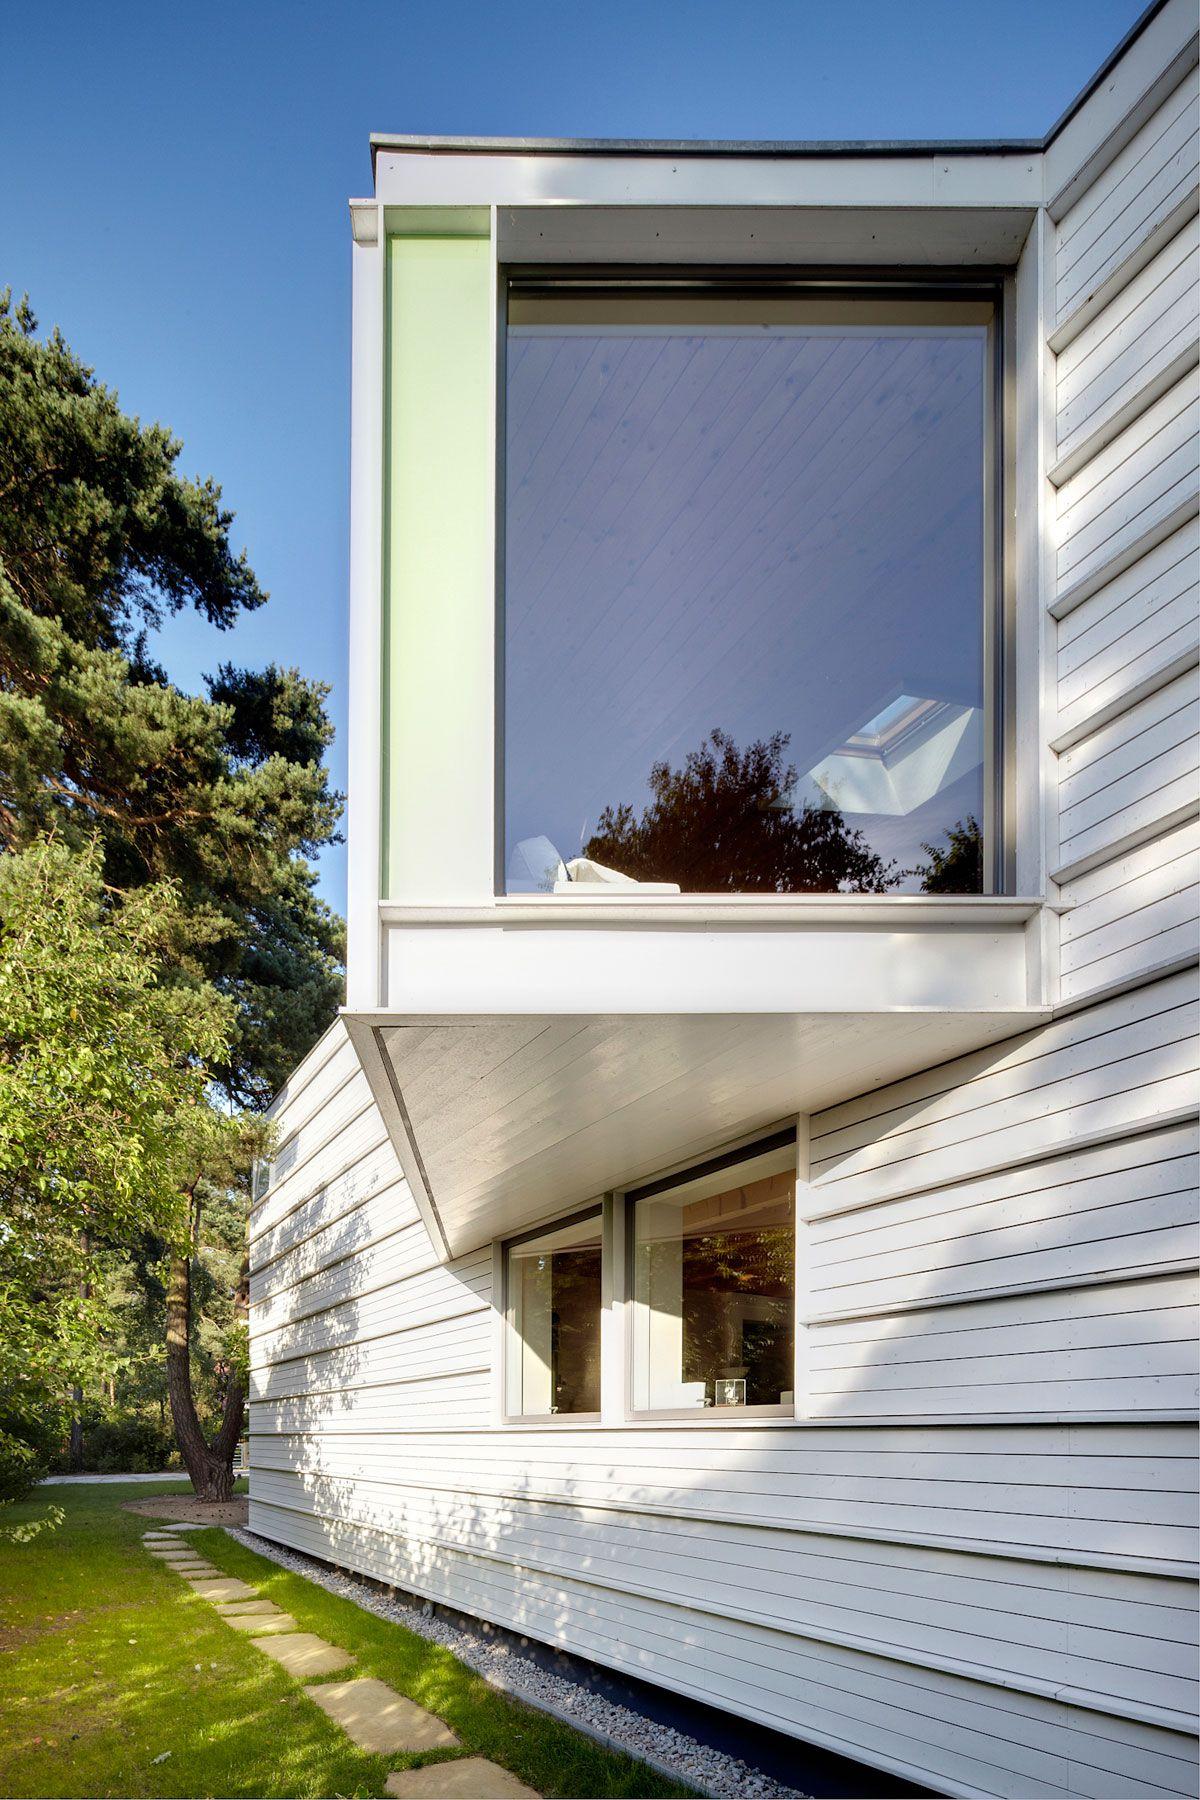 Lakeshore-House-in-Potsdam-02-2